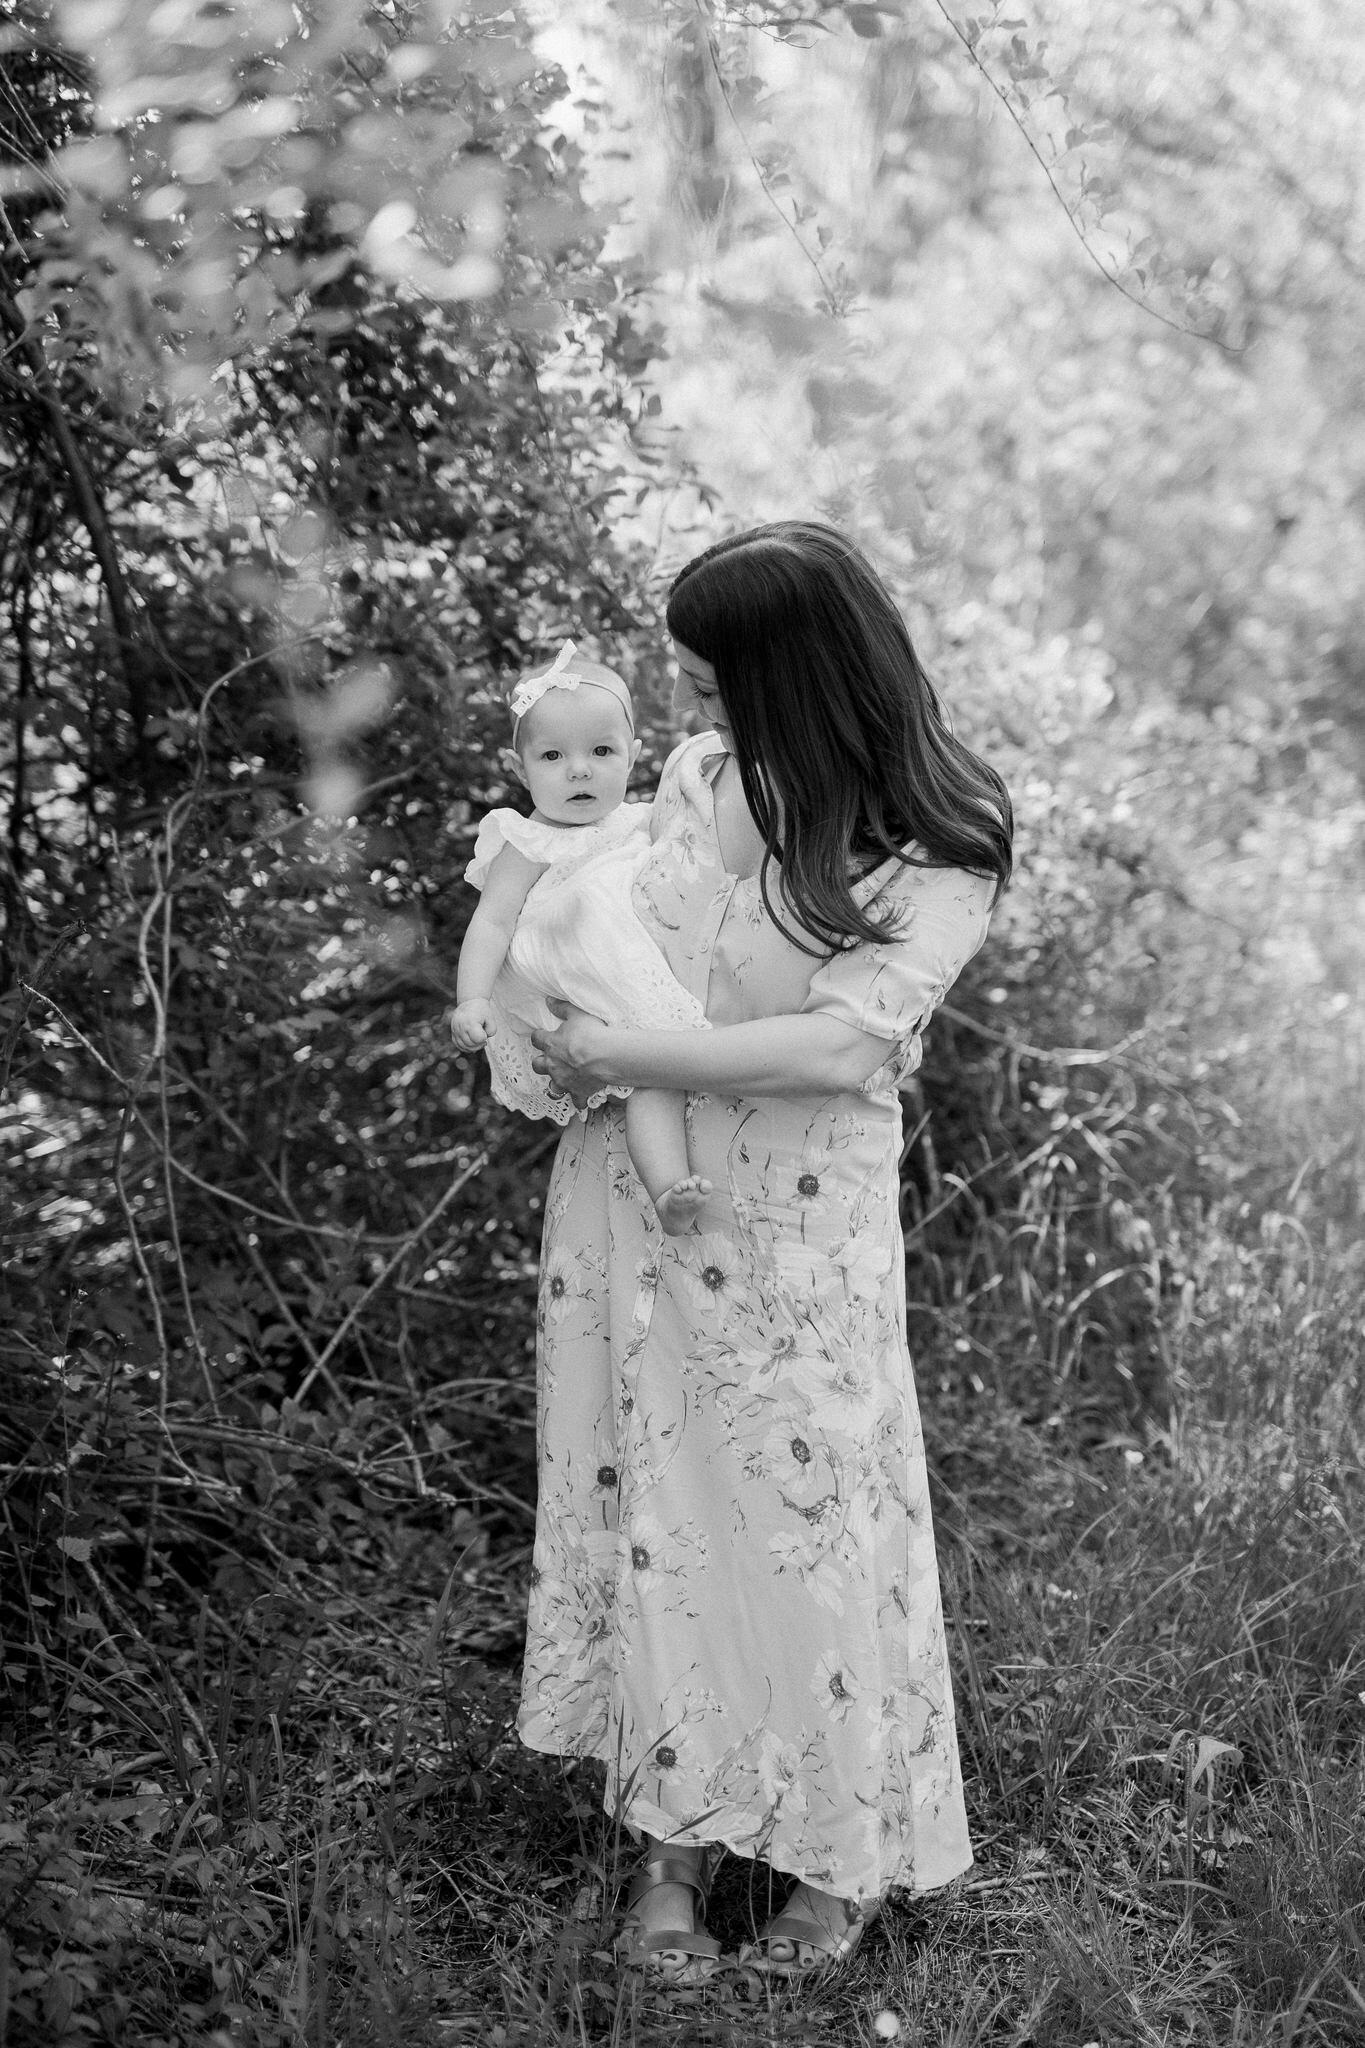 ct motherhood session_motherhood story CT_motherhood photographcer CT_3.jpg